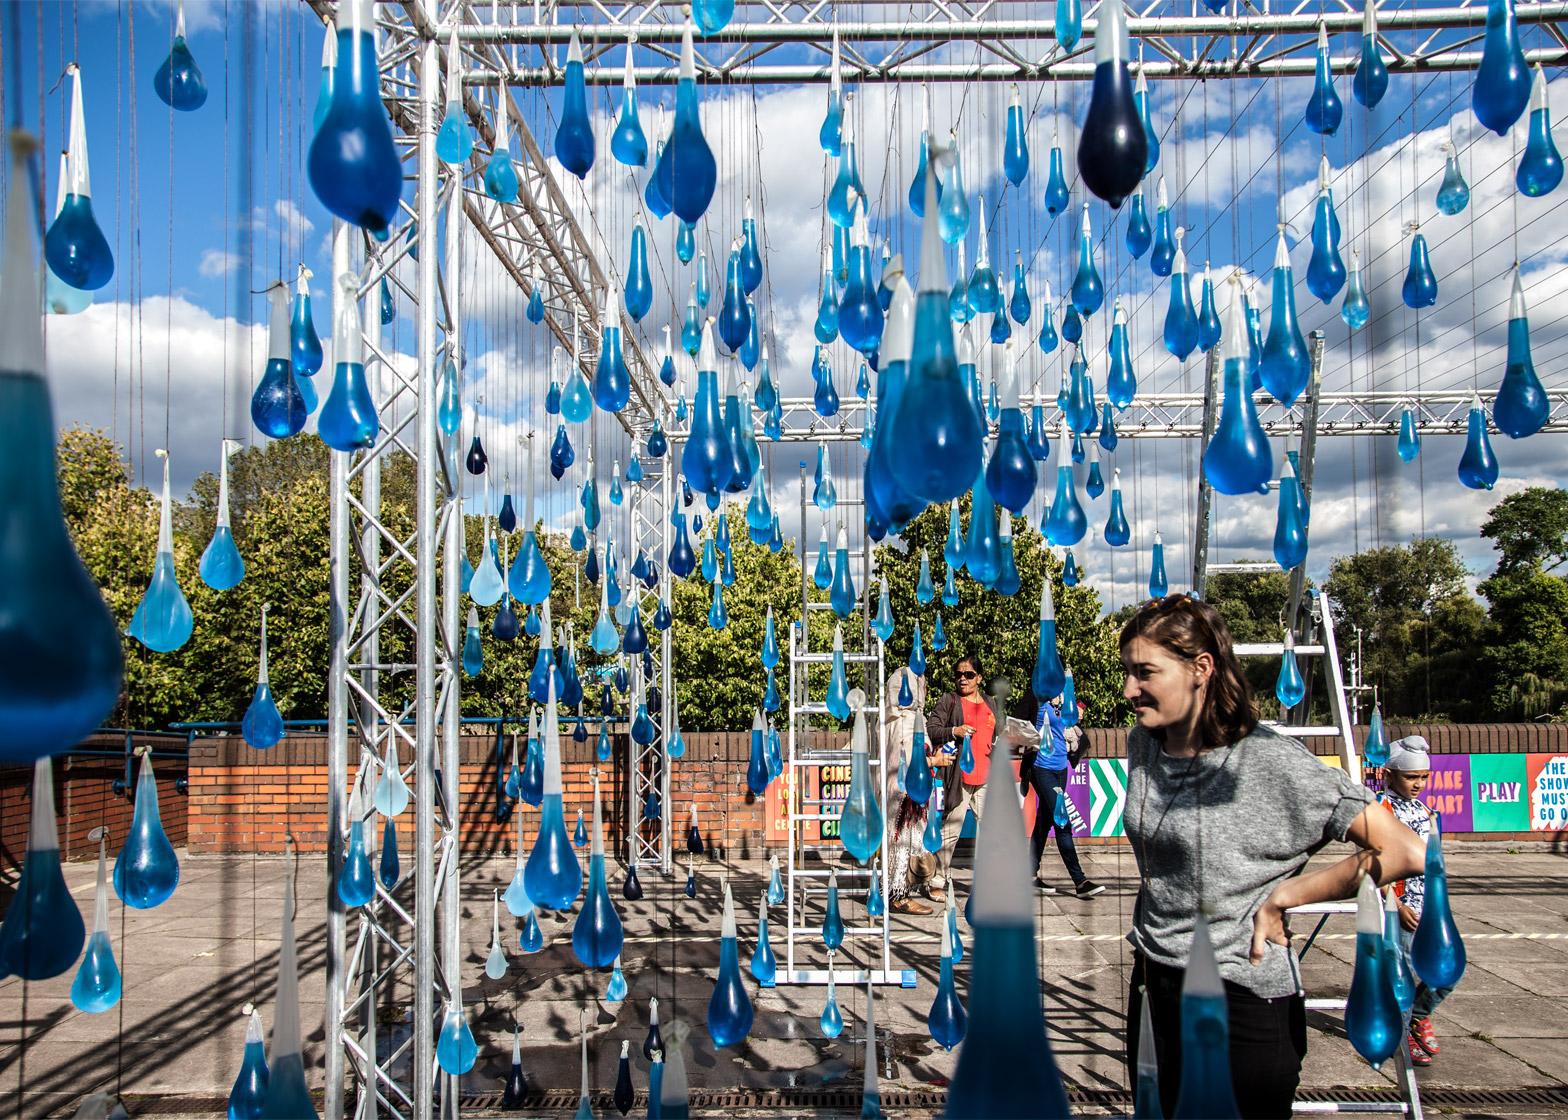 Luz-Interruptus-Rain-Interactive-installation-hisheji (3)